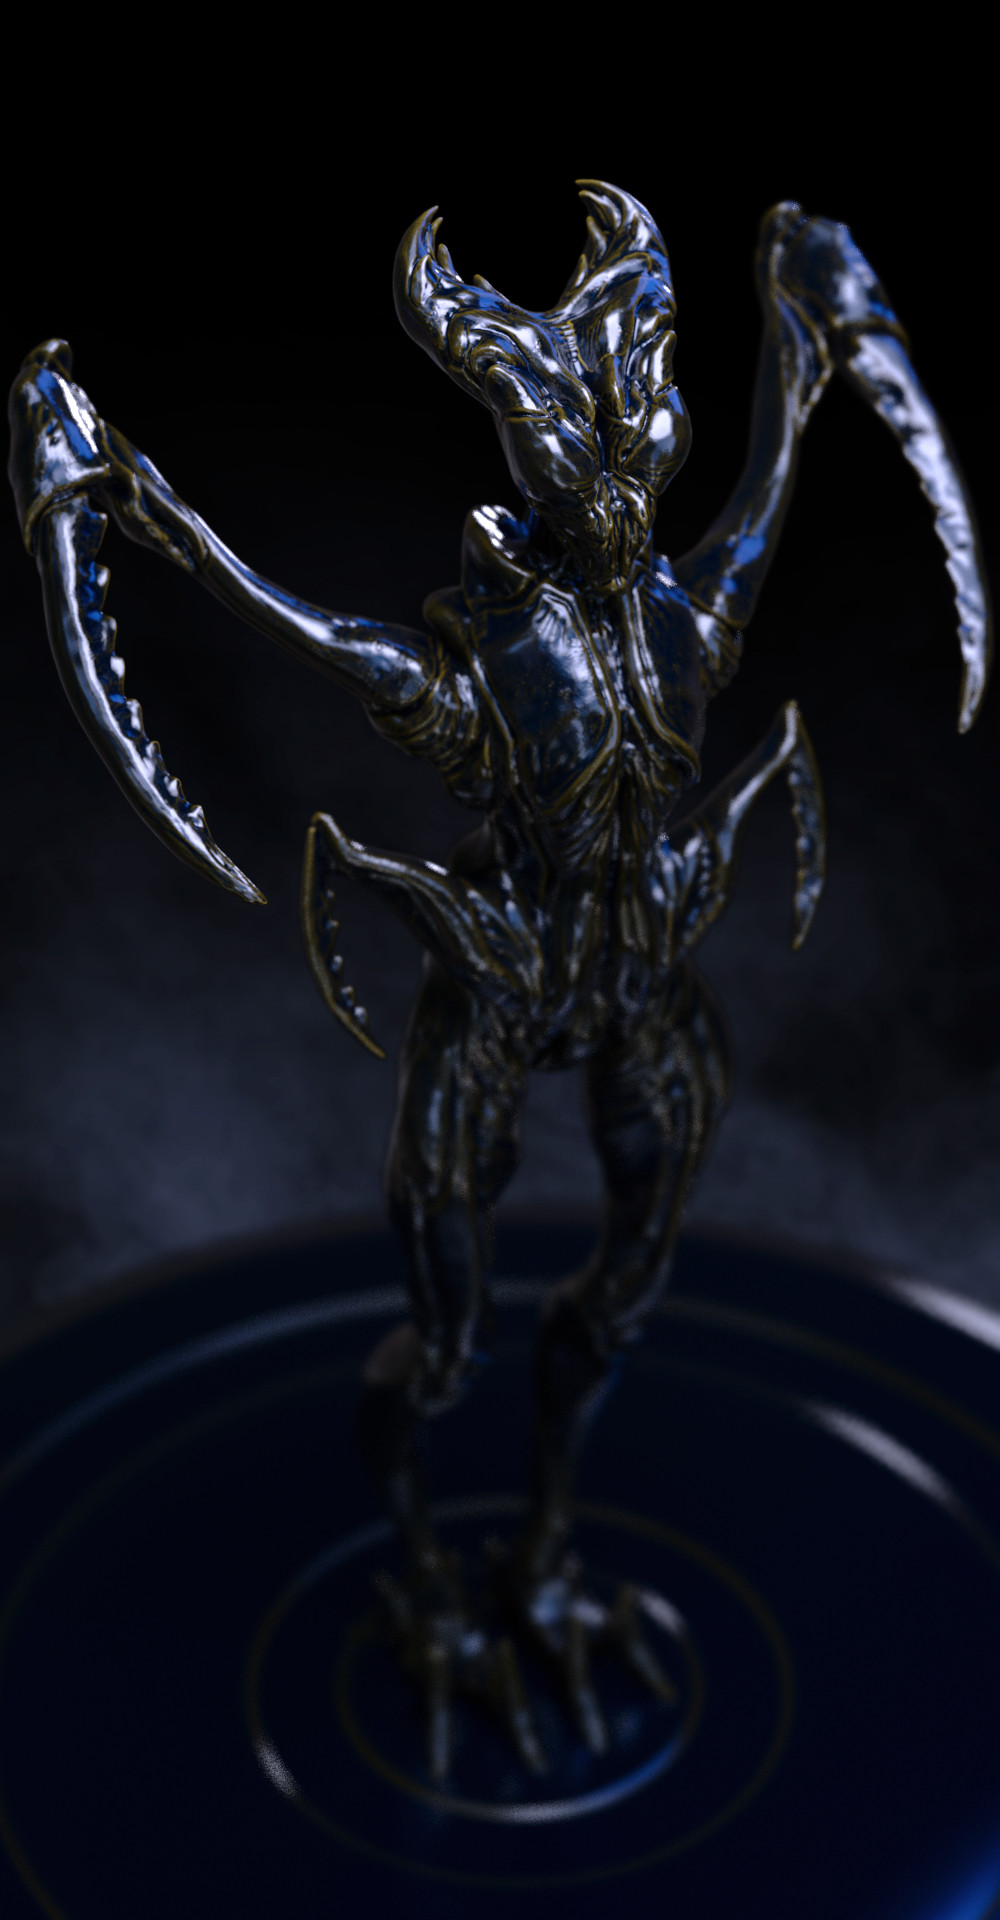 Ilhan yilmaz insectoid render sheet v03